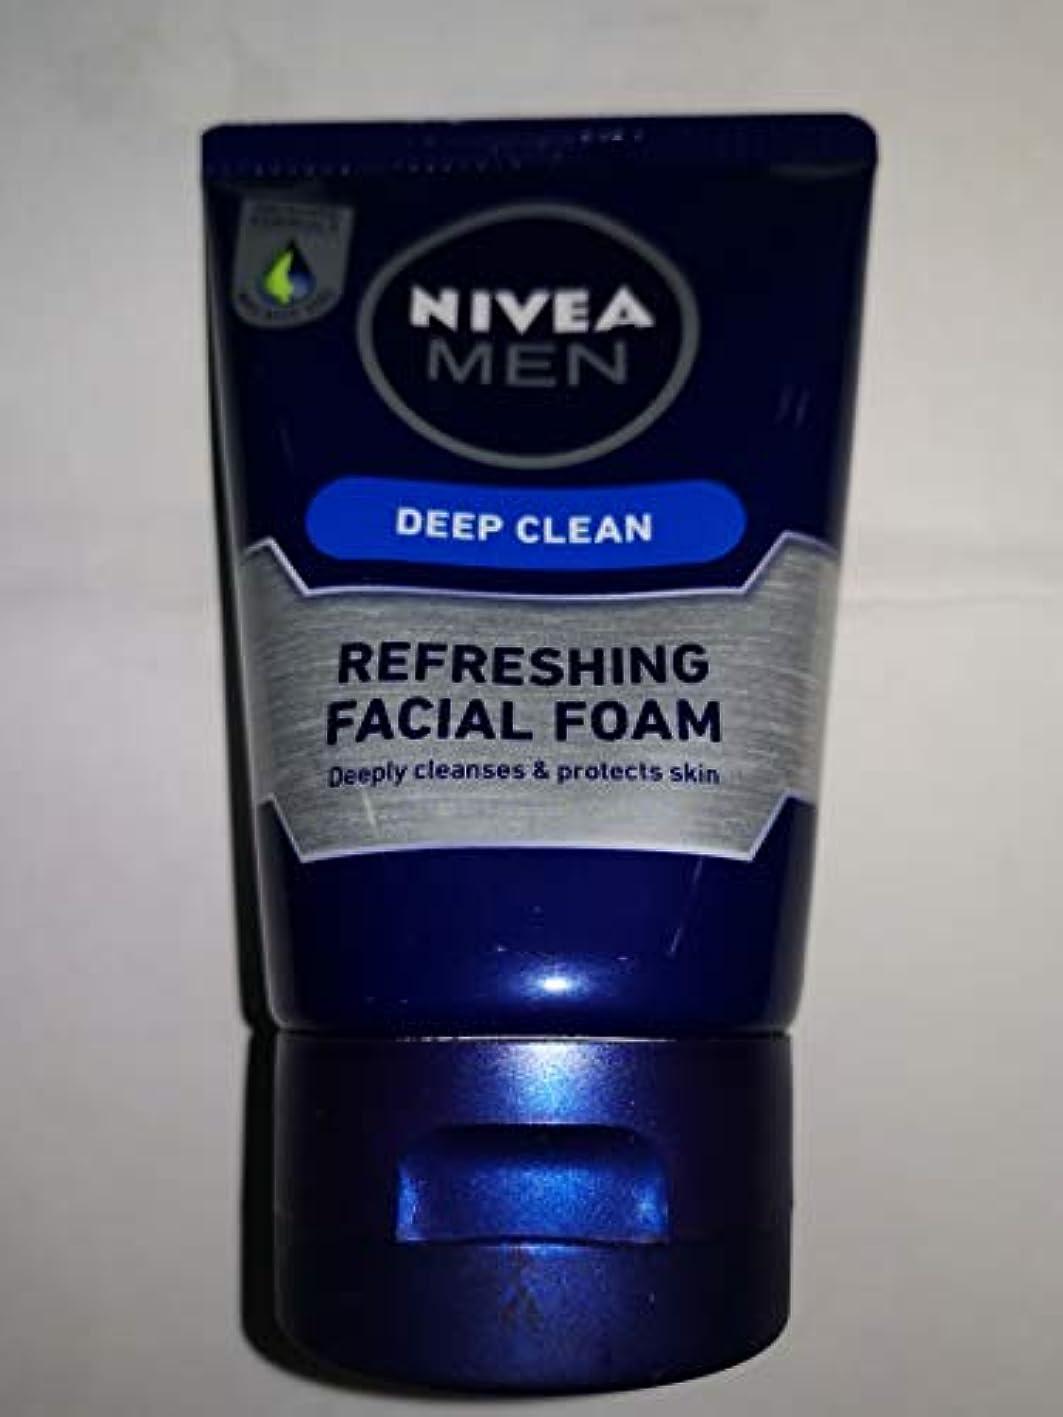 Nivea For Men 100グラムディープクレンジング洗顔料は、傷の健康を減らし、汚れや不純物を取り除く効果的に徹底的に肌を清潔にし、